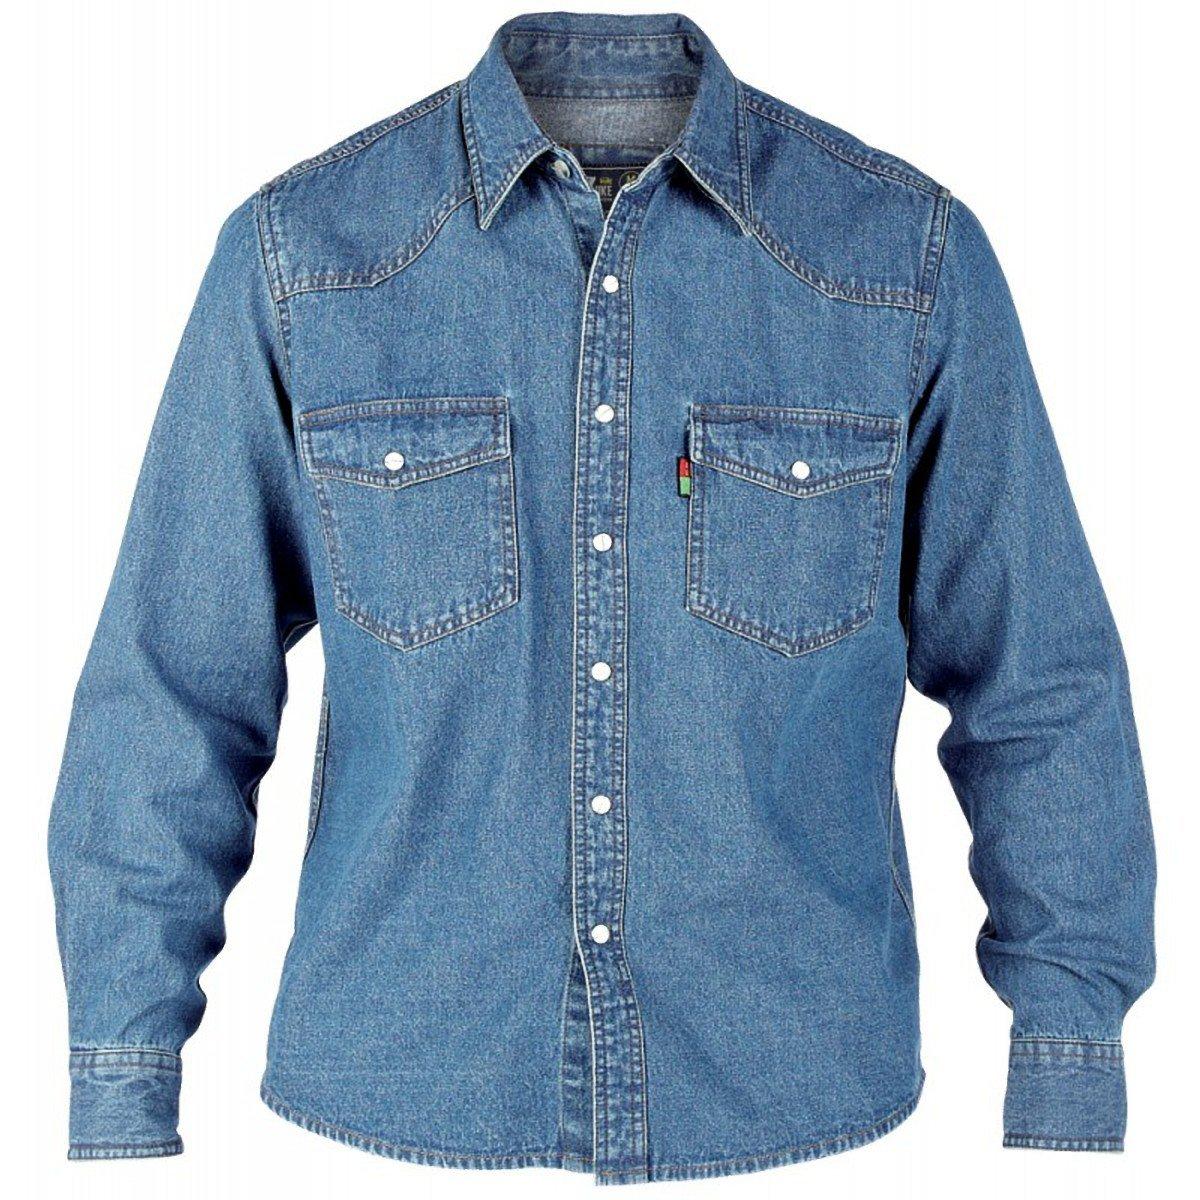 Duke Quality New Mens Blue Denim Shirt Long Sleeve Casual Classic Western Black